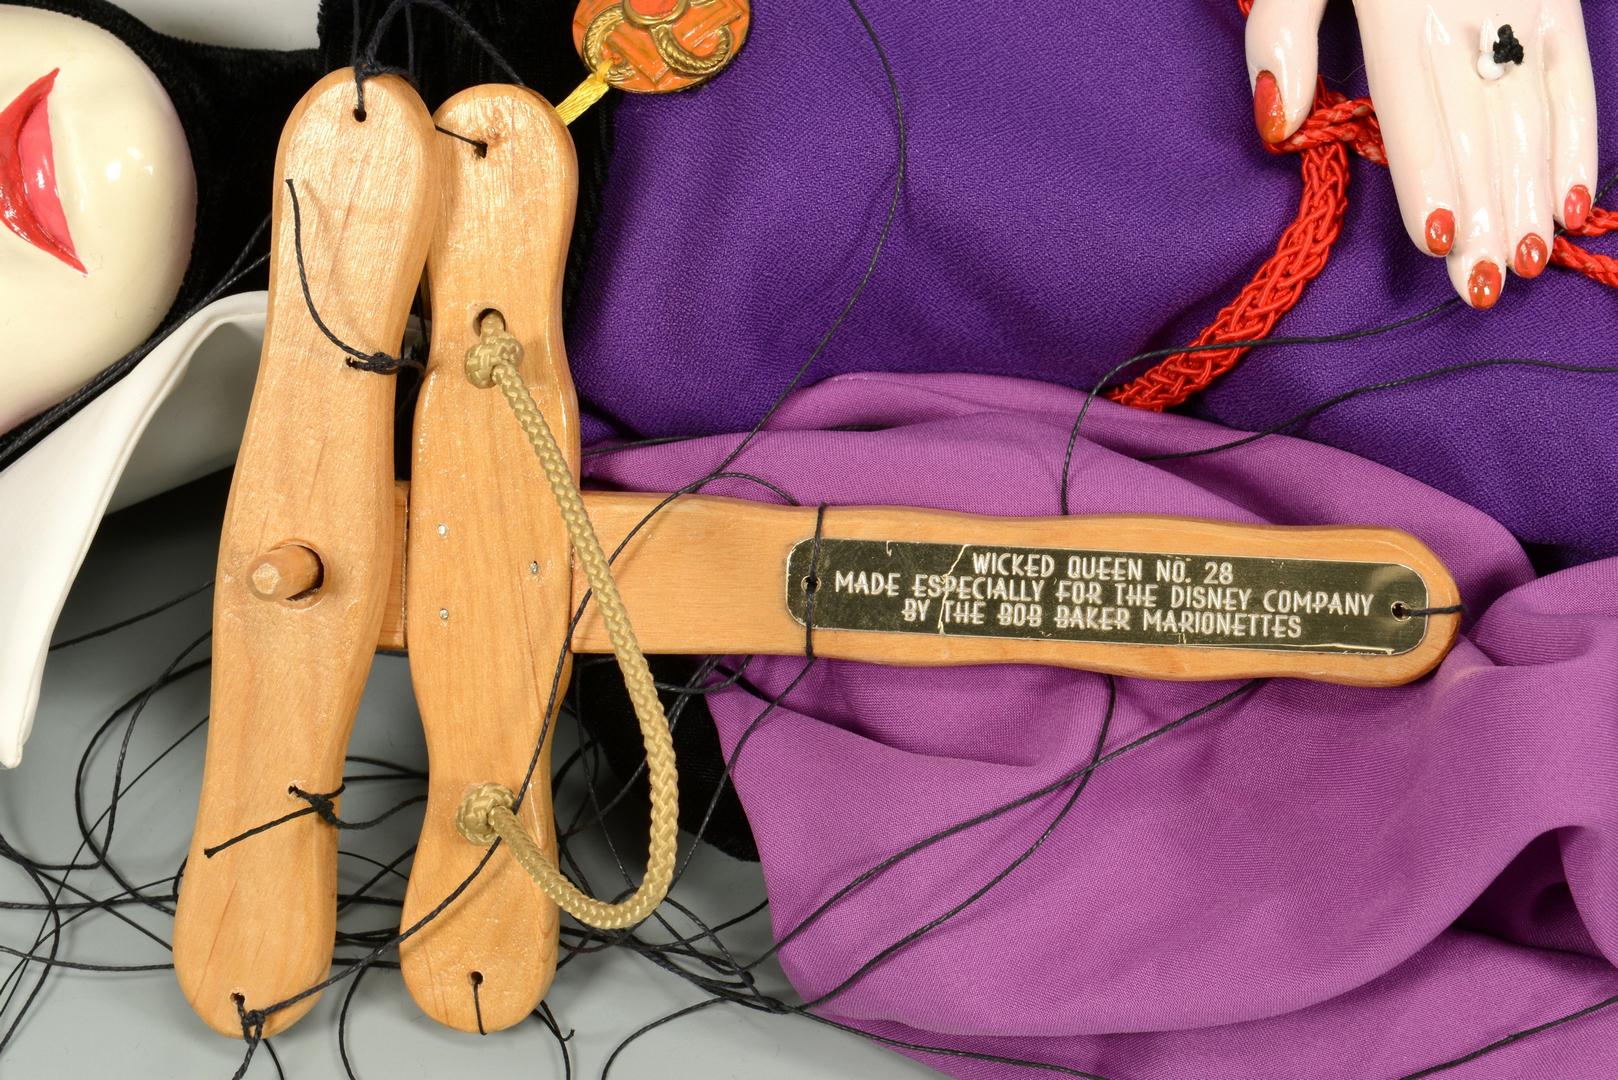 Lot 3088308: 2 Bob Baker Disney Marionettes